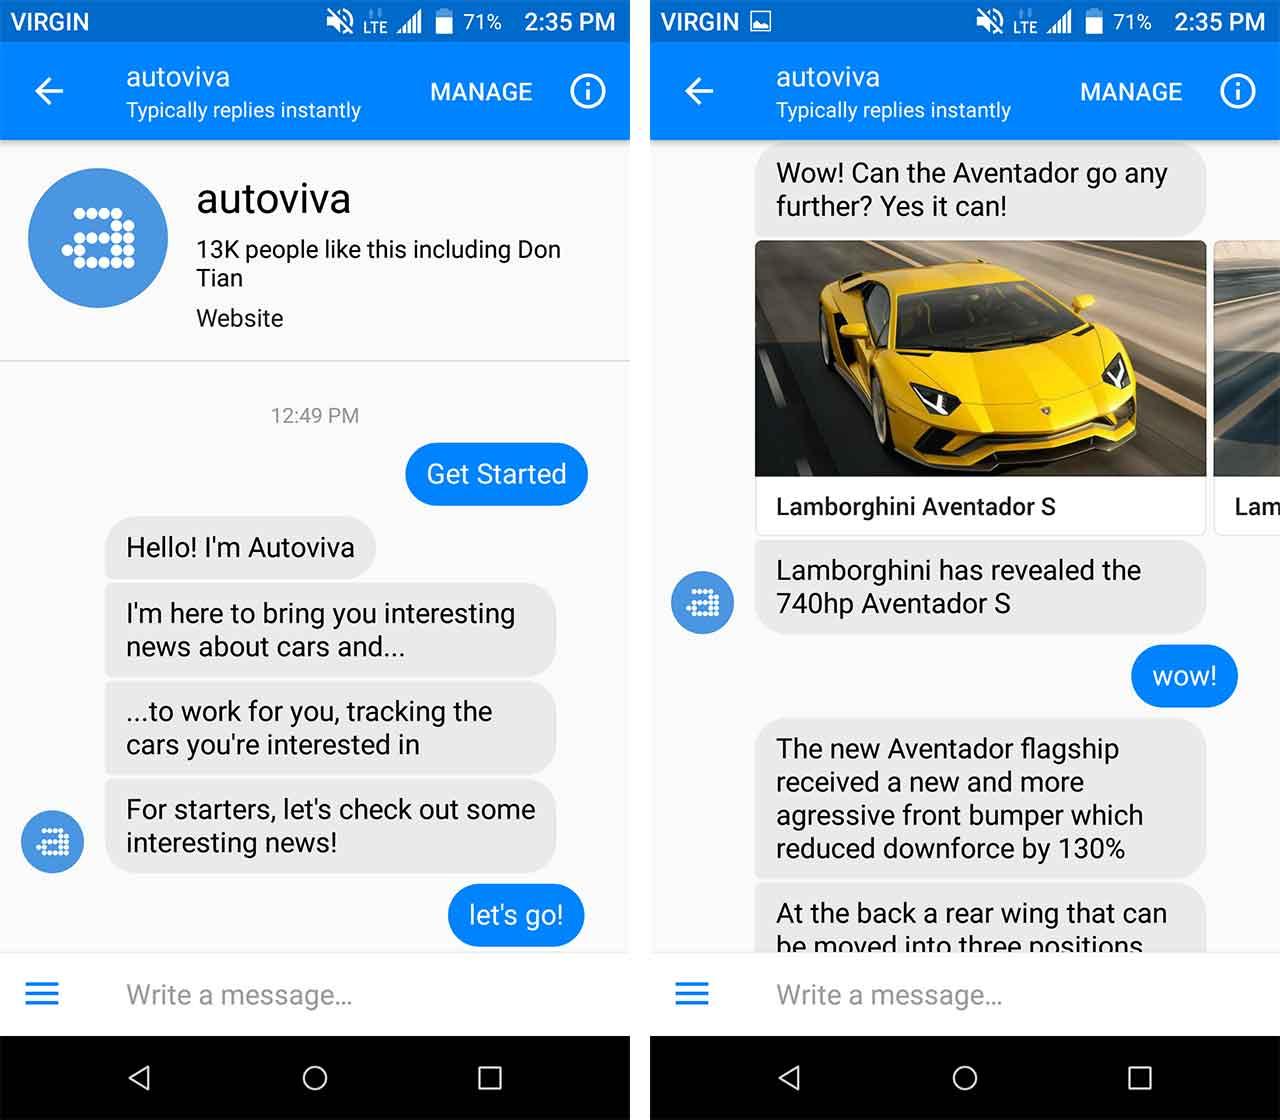 autoviva bot beginning convo